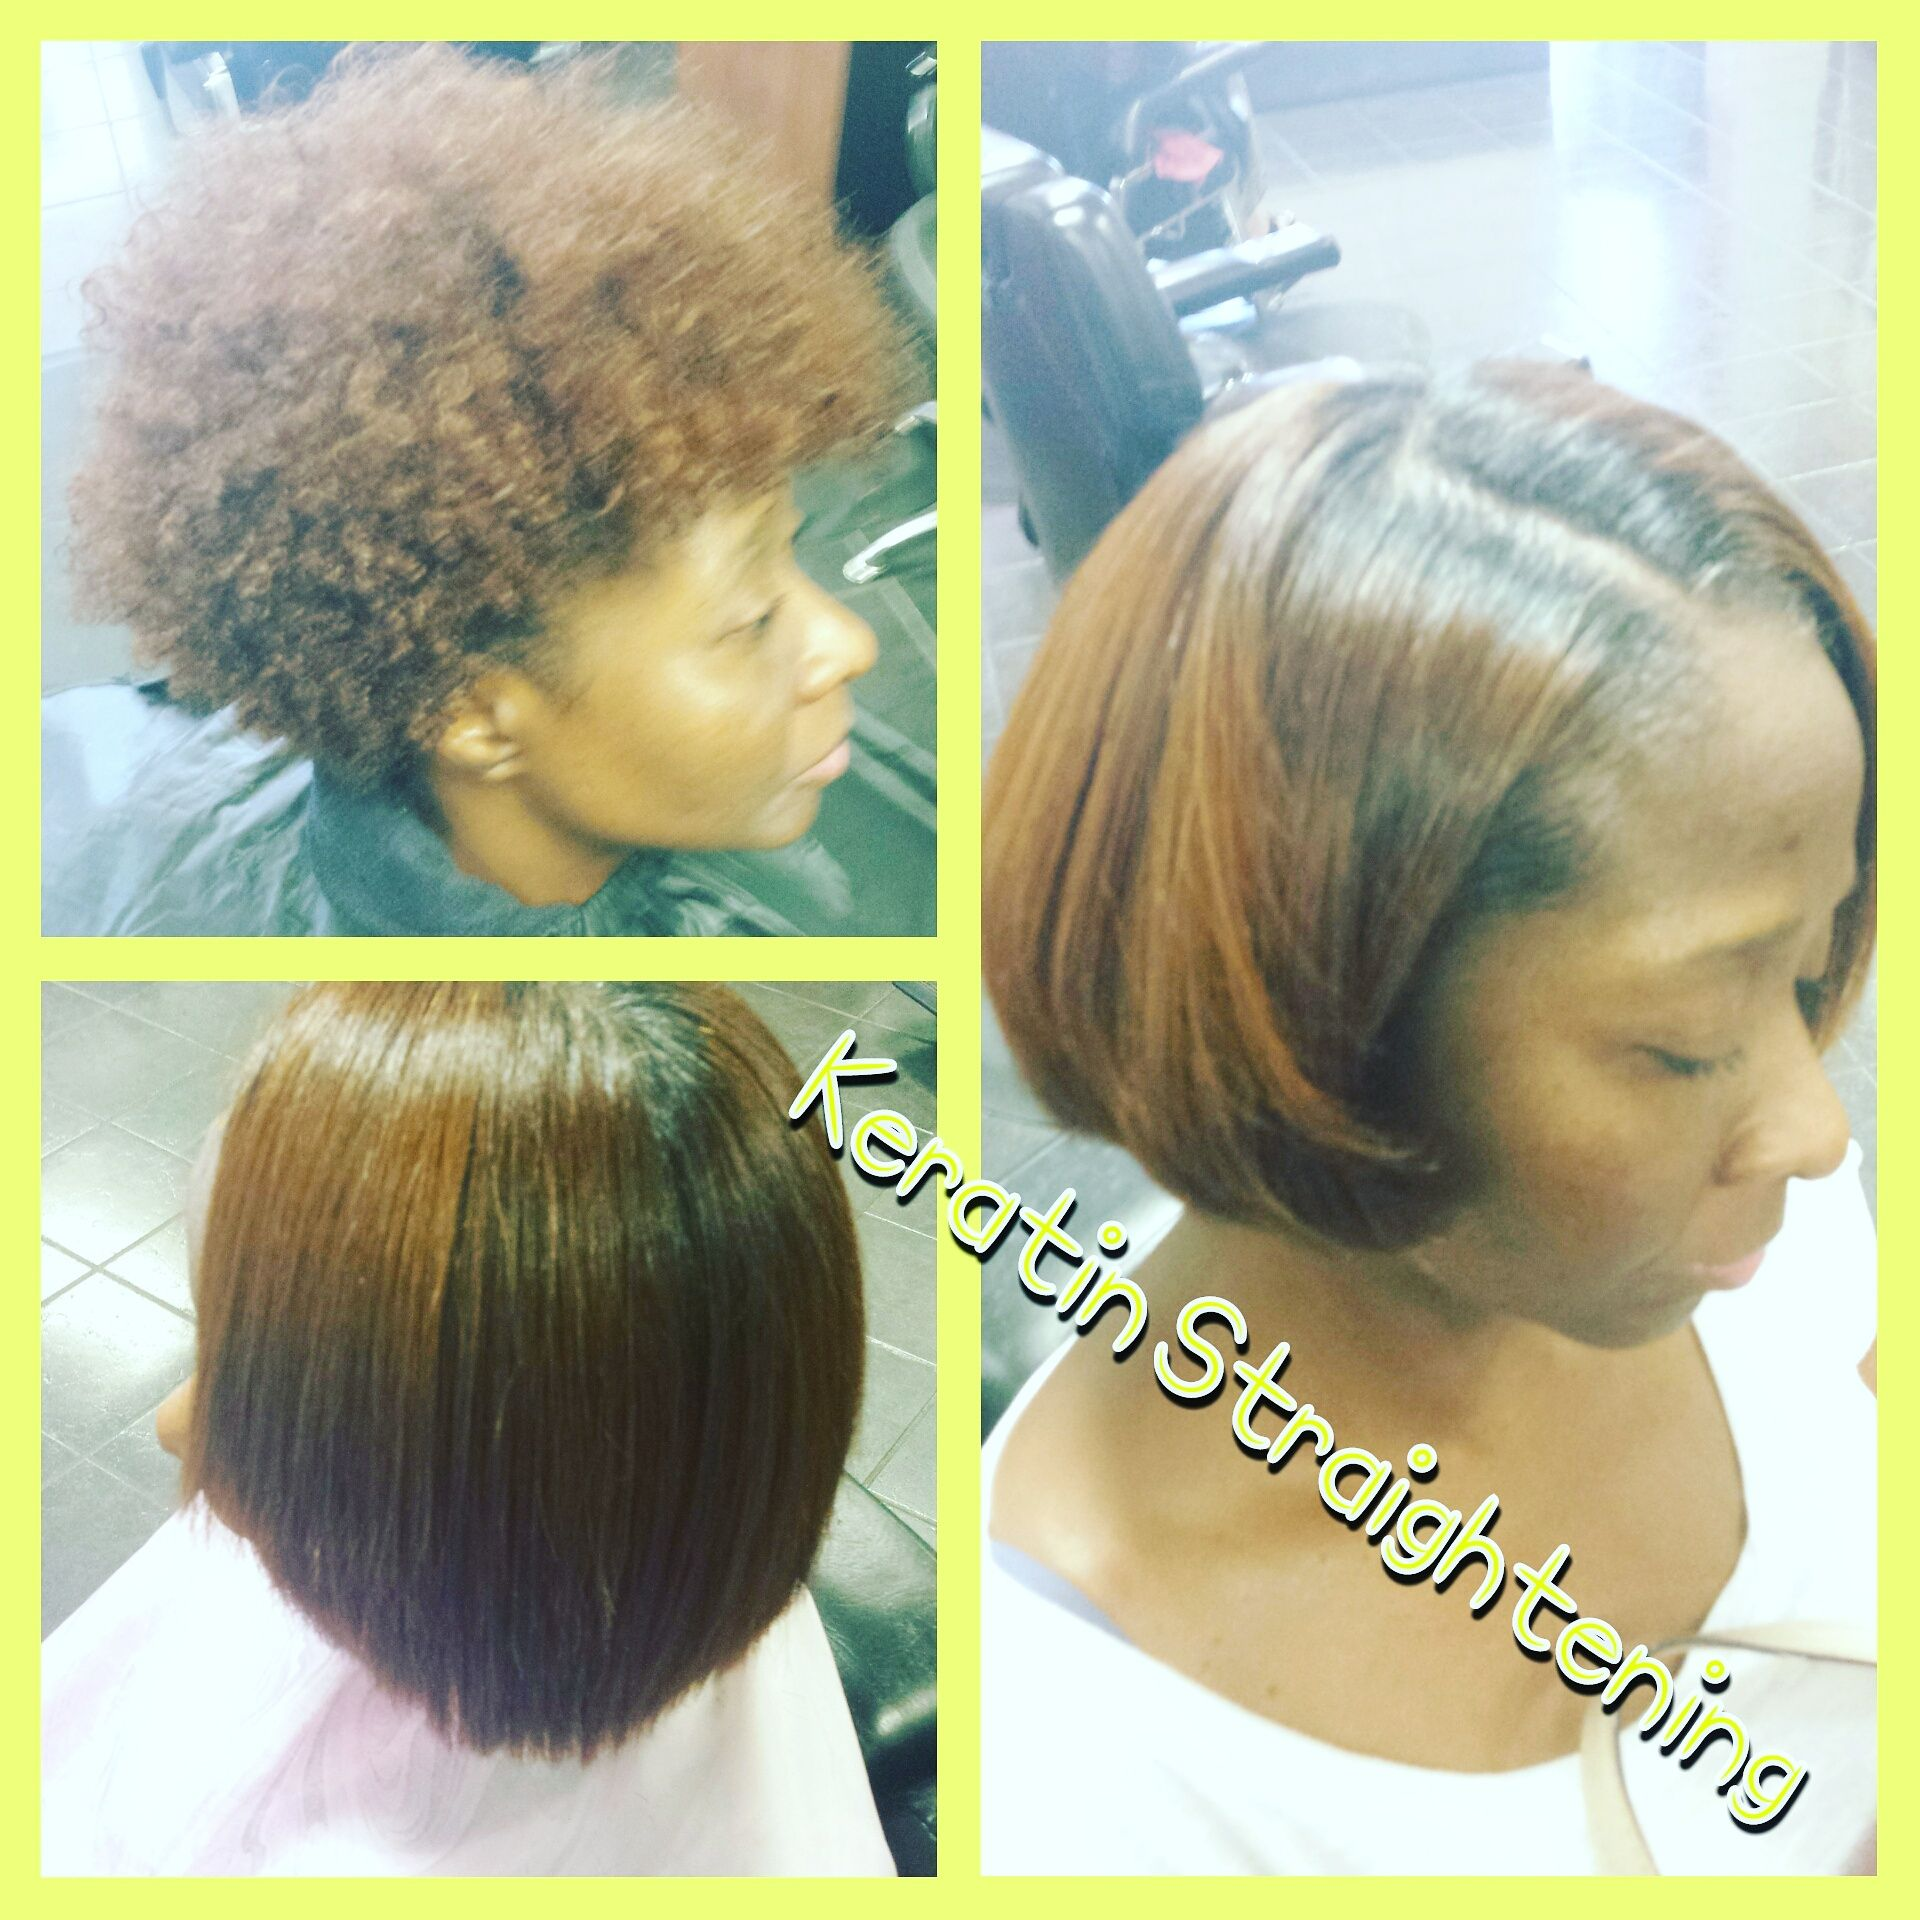 Keratin Hair Straightening At Trendz By Tammy Hair Salon Houston Pearland Tx Keratin Hair Treatment Black Hair Salons Hair Straightening Treatment